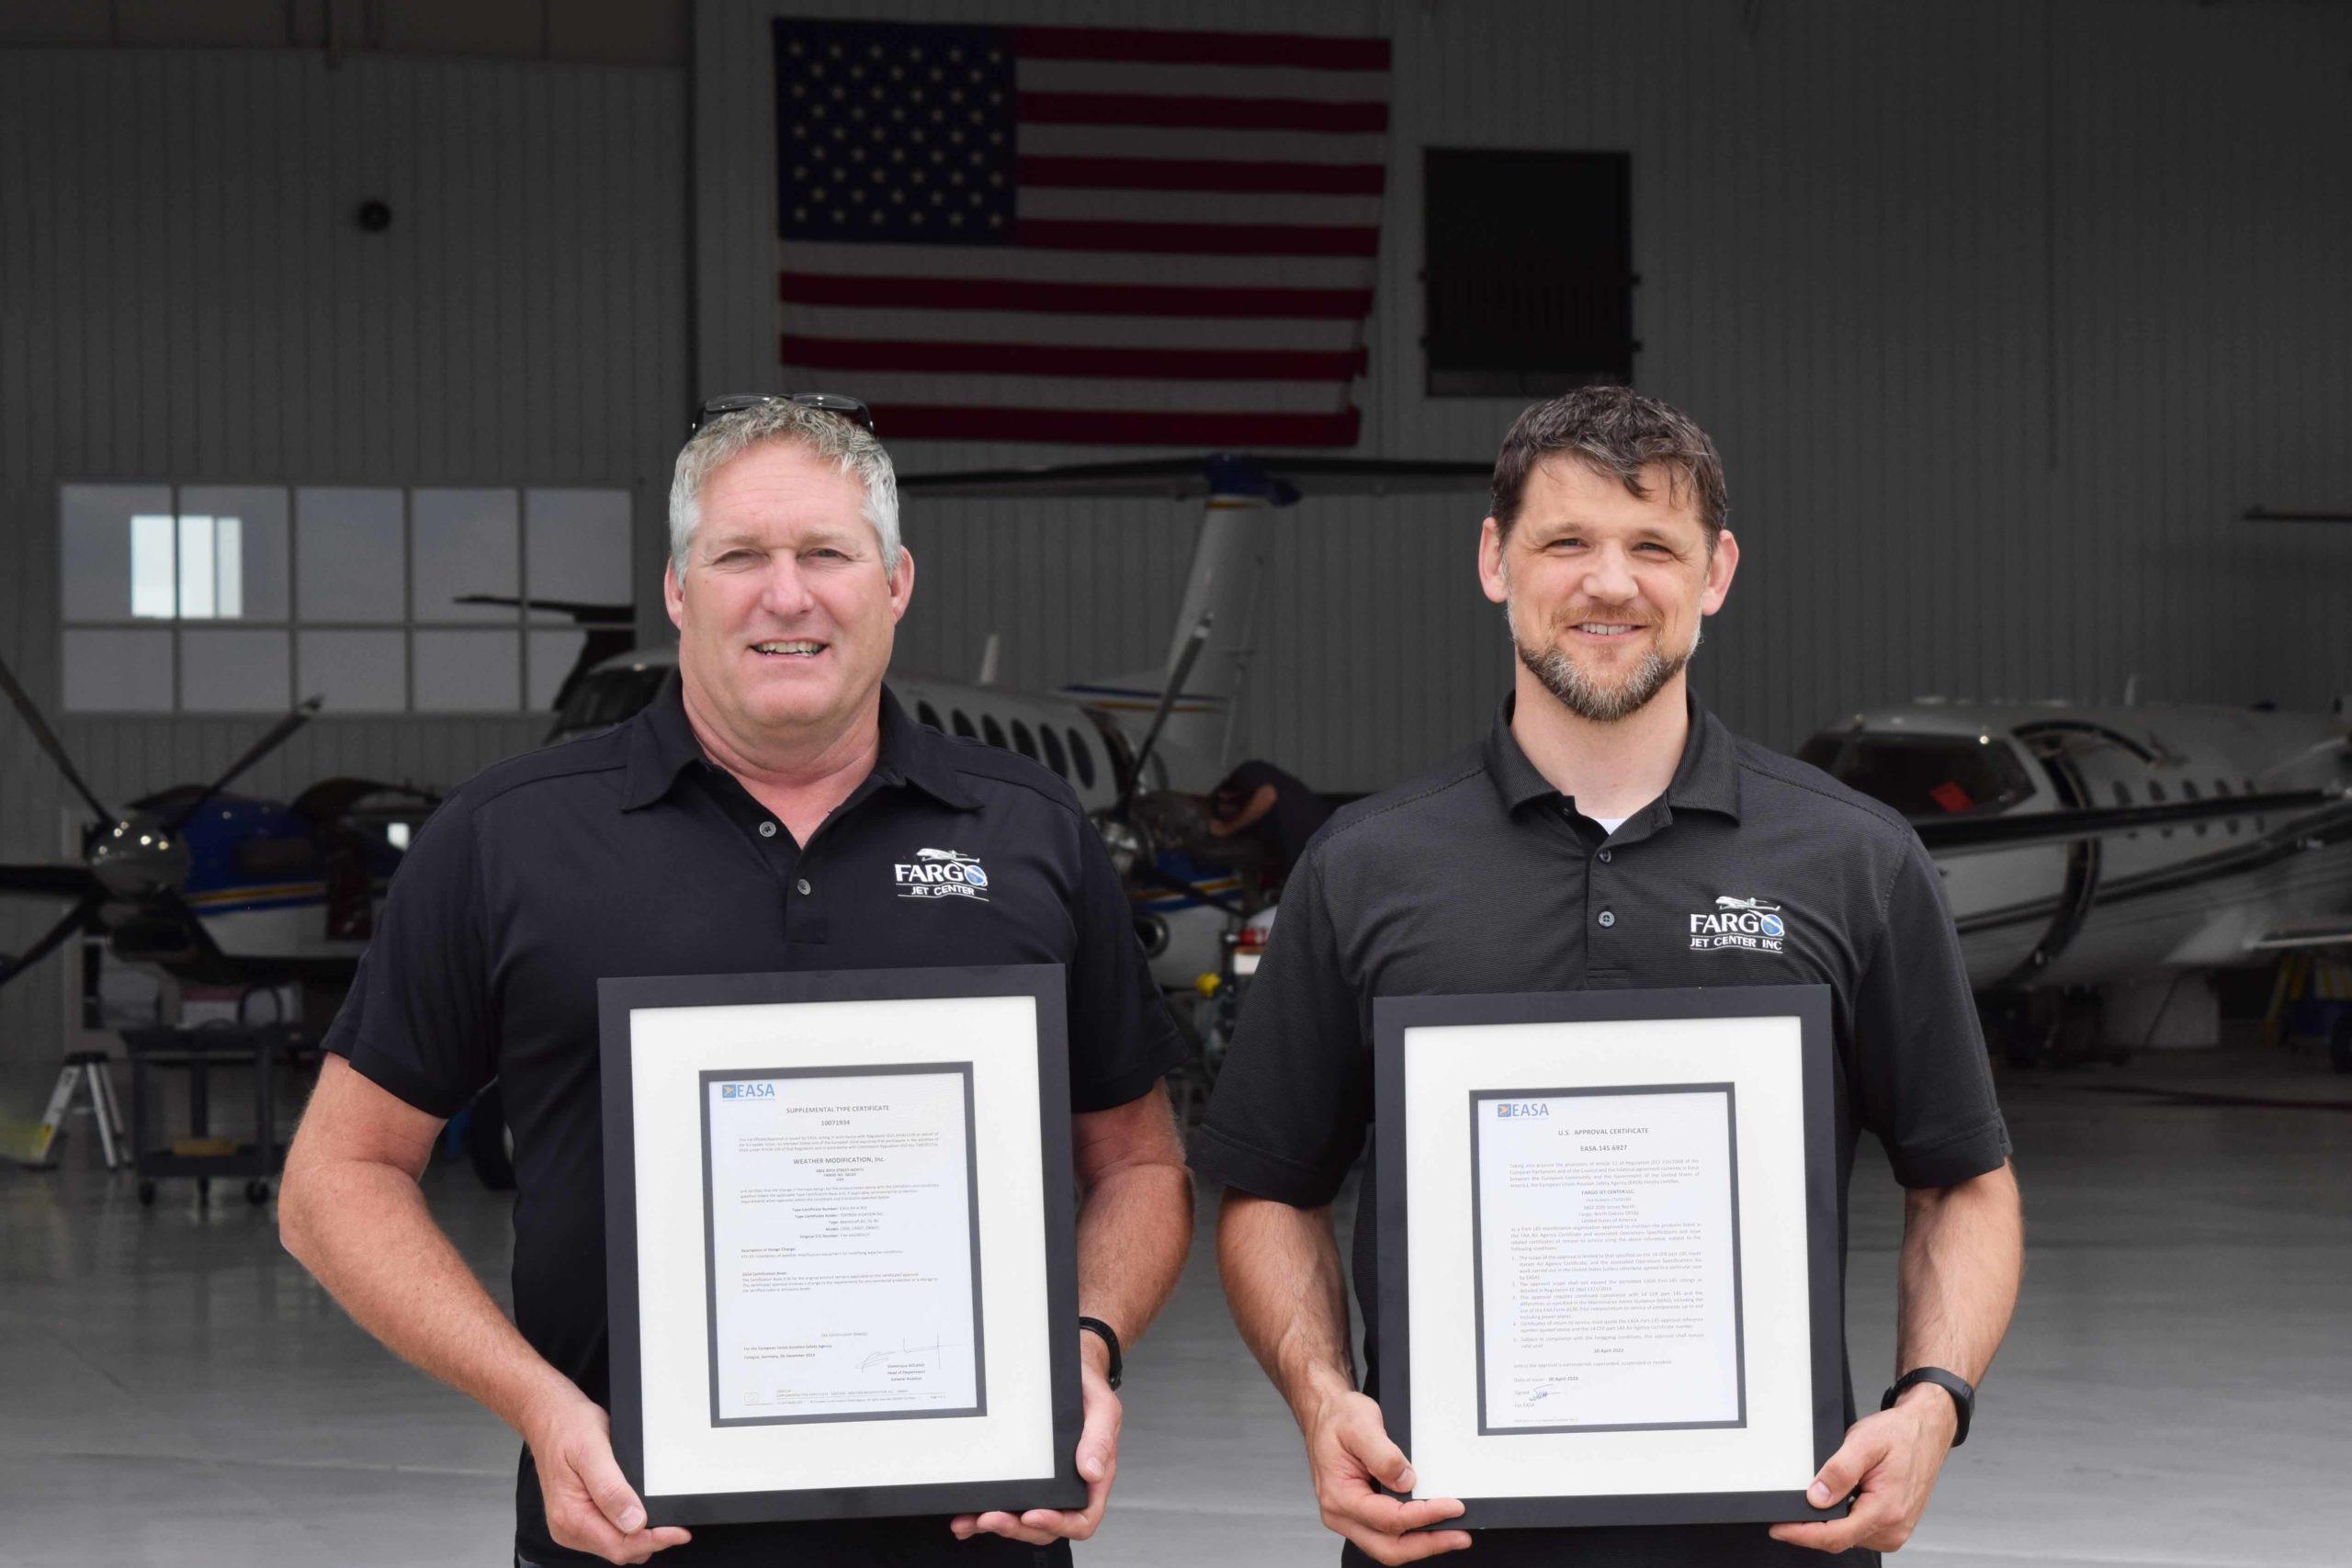 Fargo Jet Center Mike Clancy Josh Rychener EASA Certification